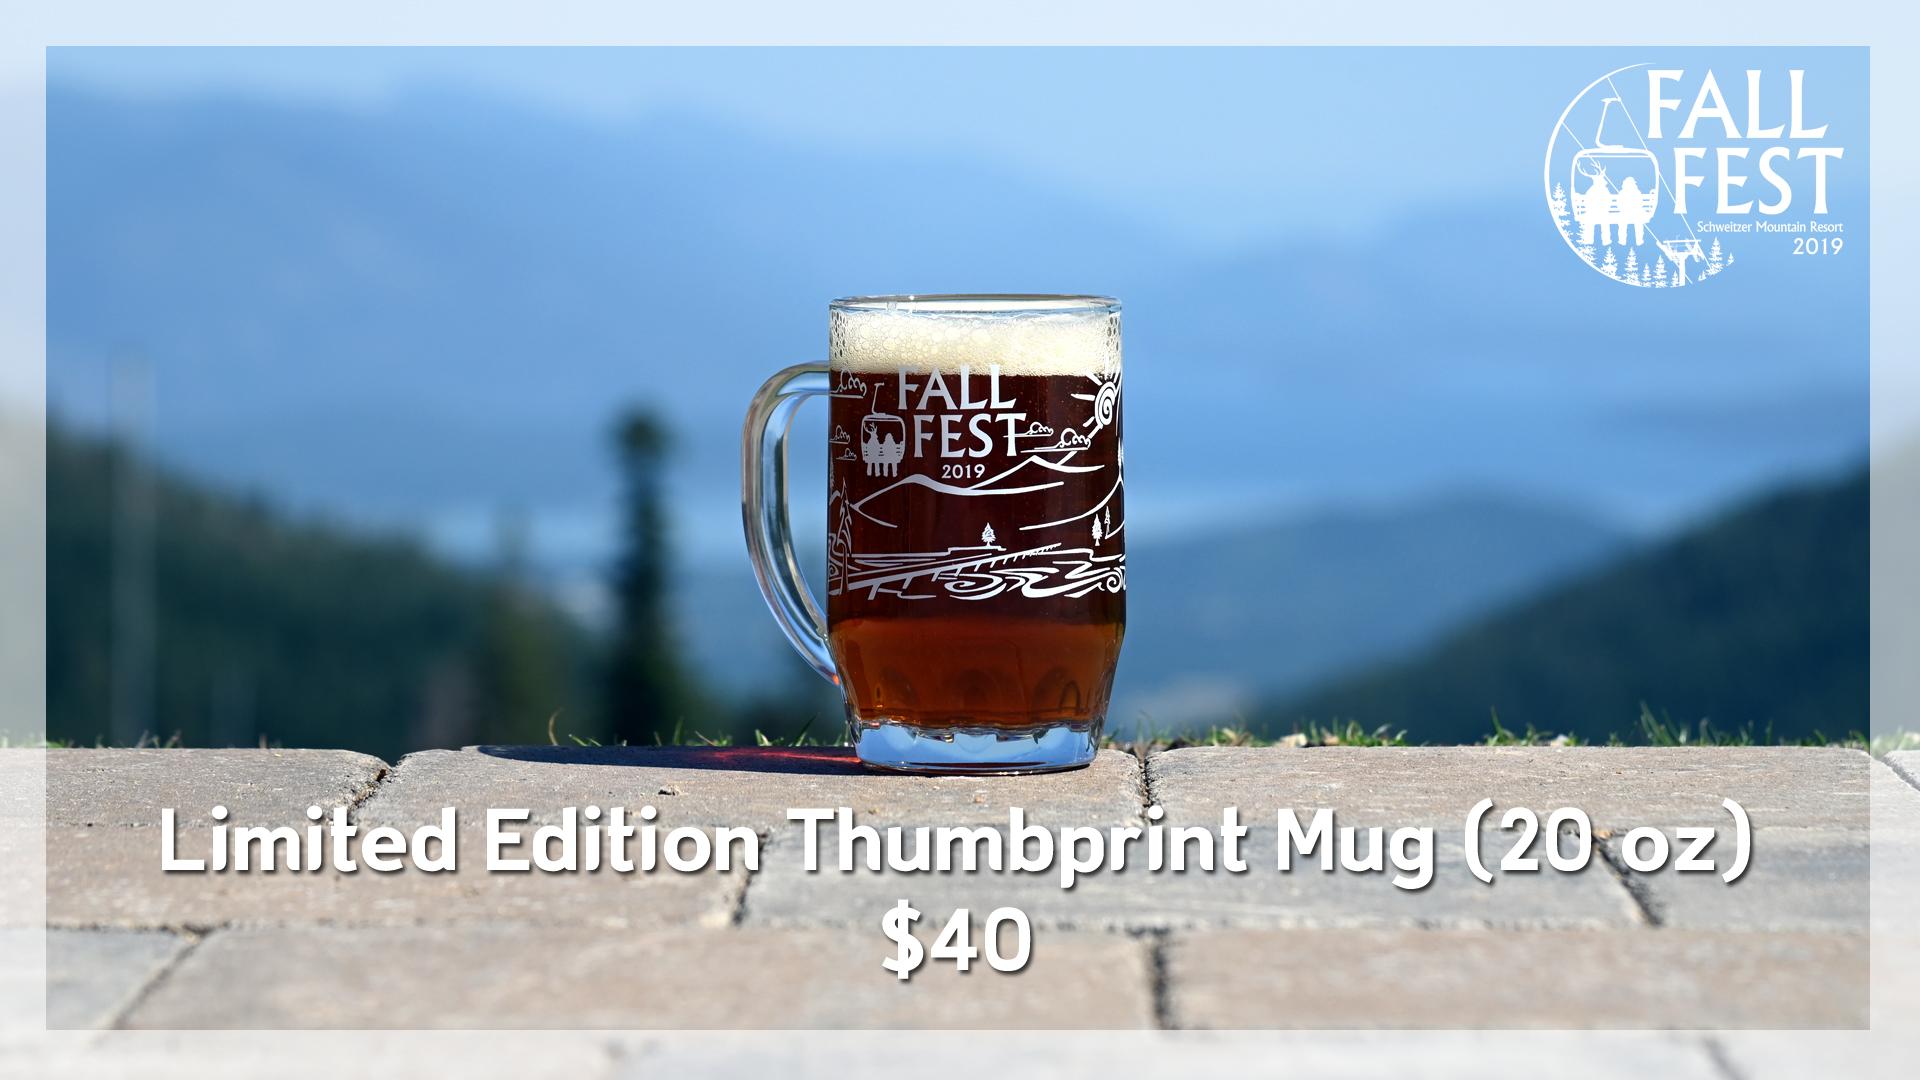 Fall Fest Thumbprint Mug